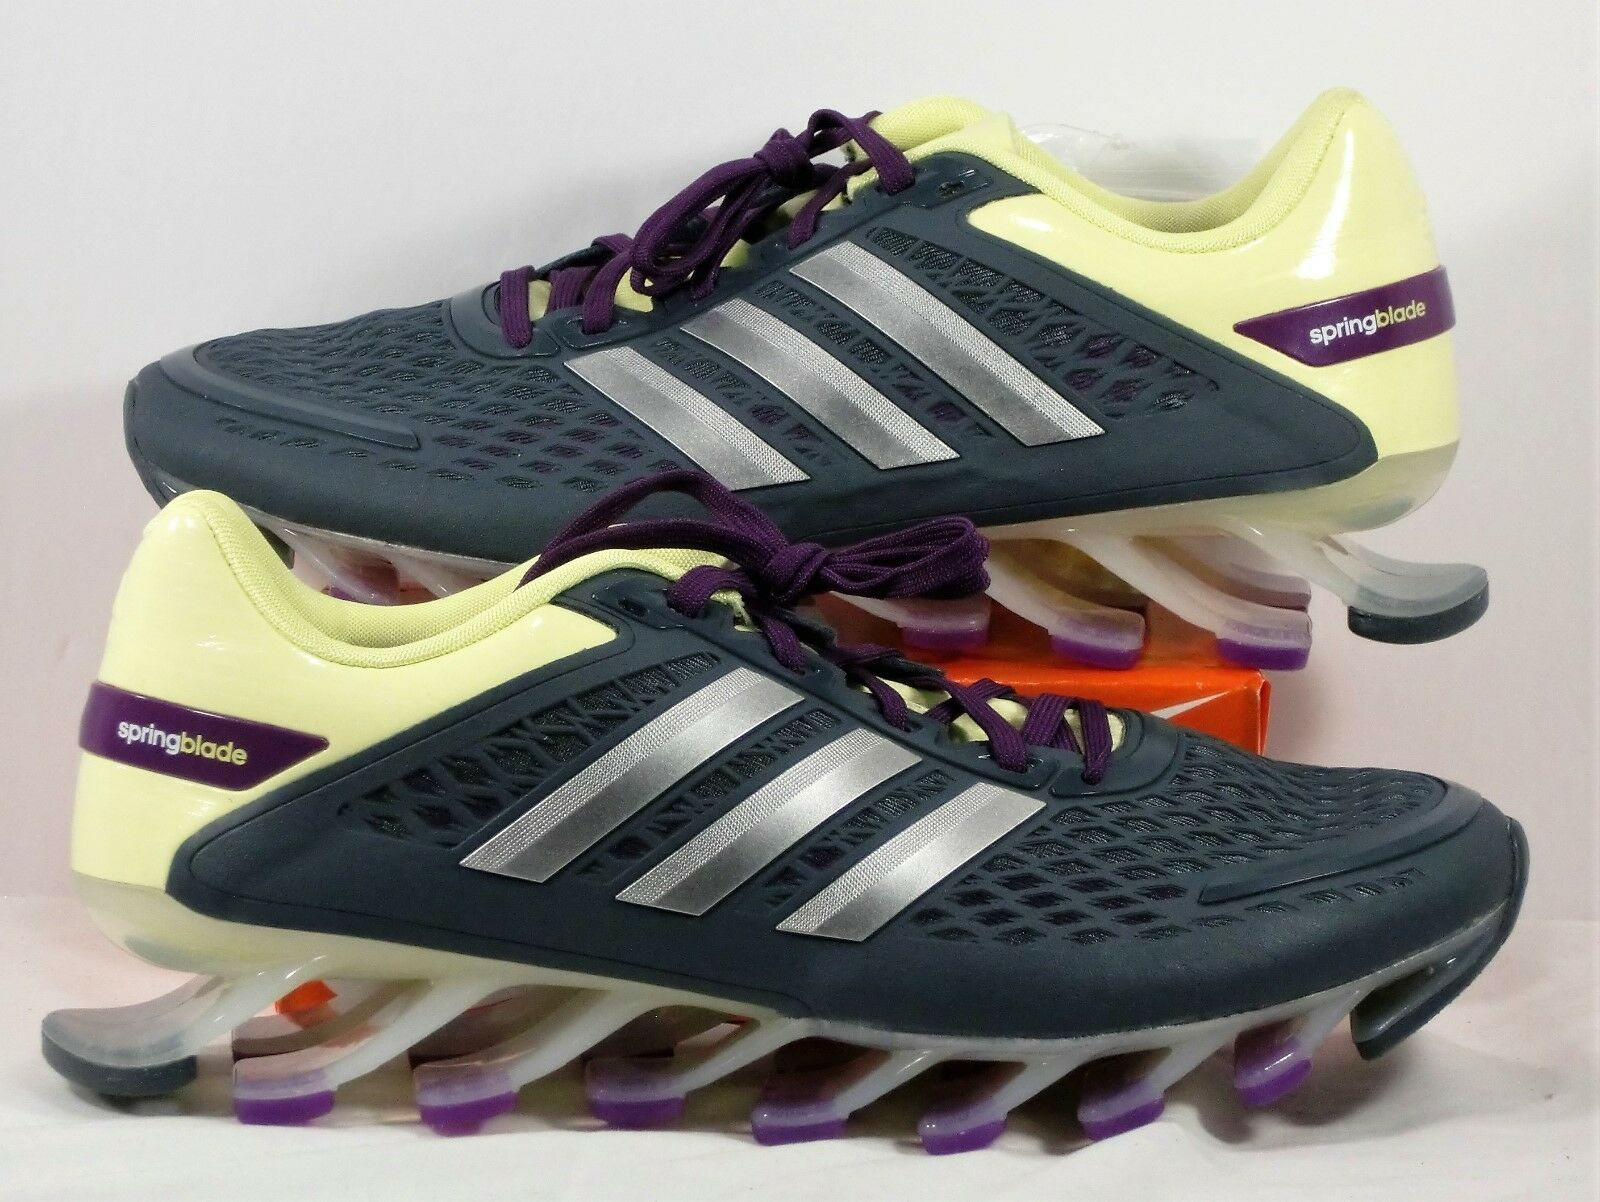 Adidas Springblade Razor Glow & Metallic Silver Running shoes Sz 6 NEW G97688